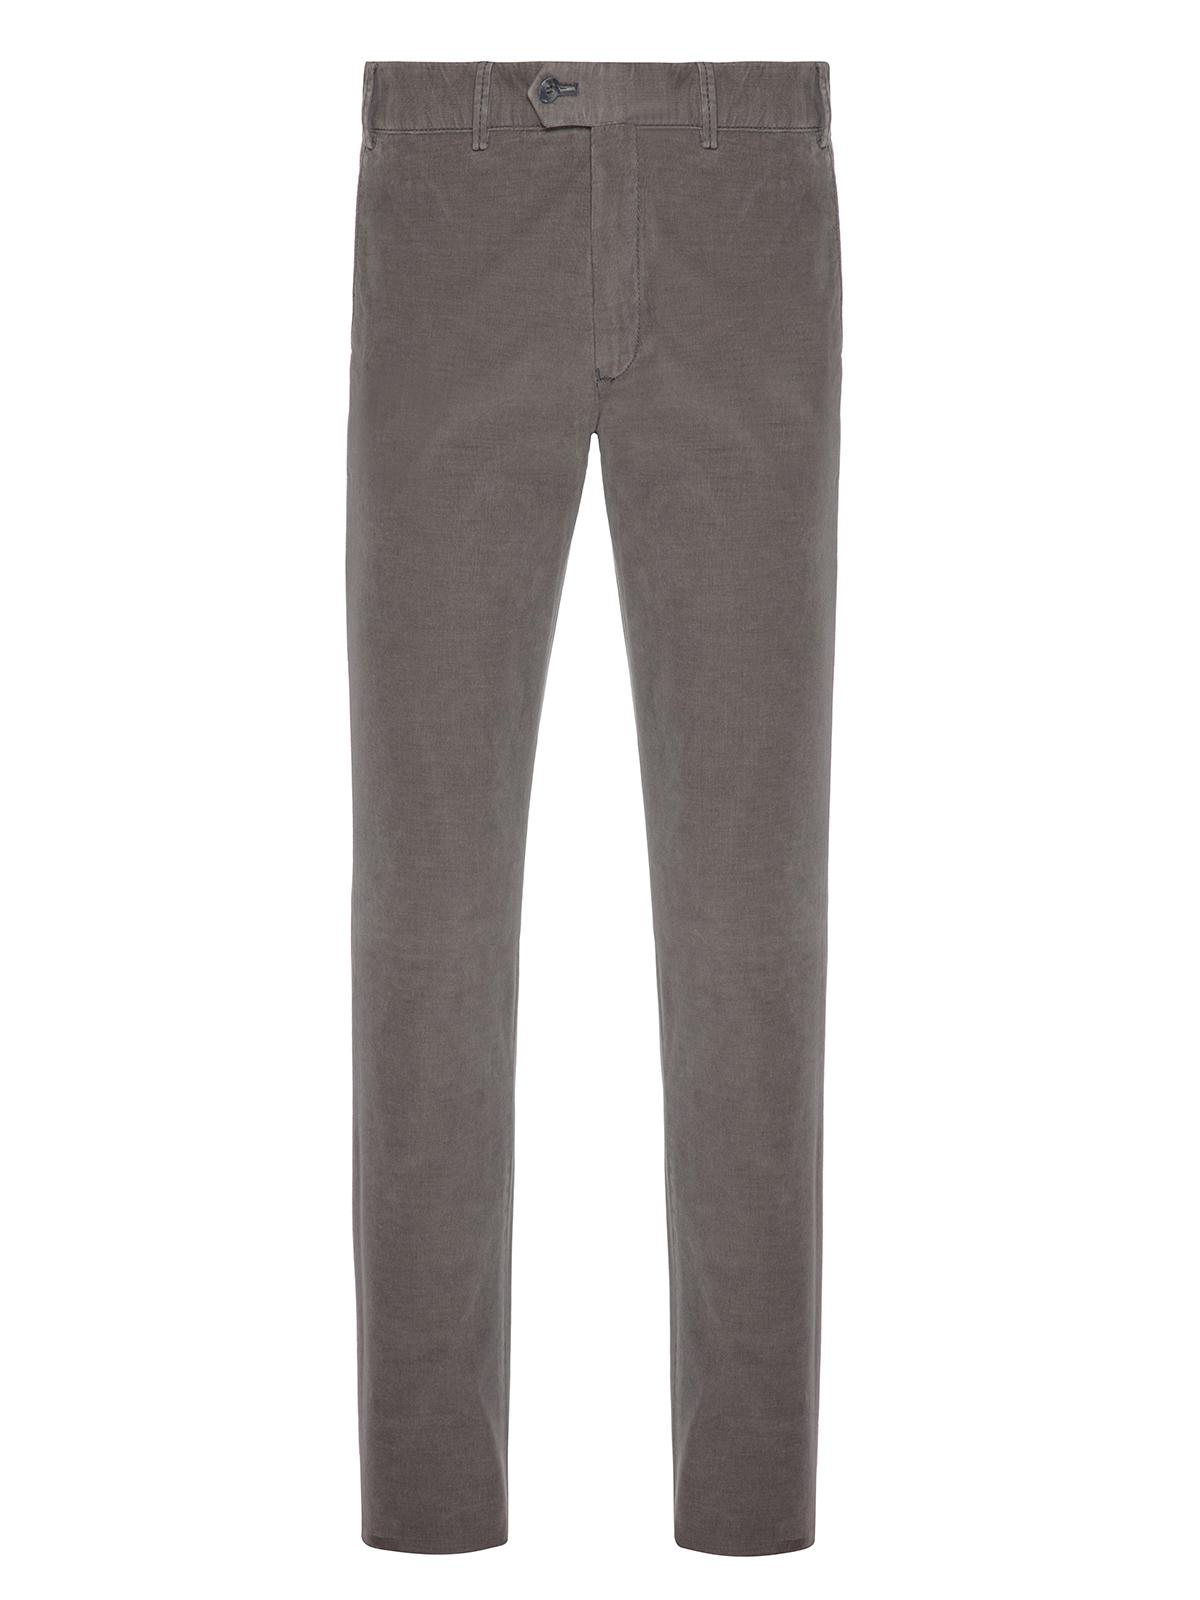 Hiltl - Hiltl Phantom Cord Coton Elastane Gri Yeşil Tierre Chino Slim Fit Pantolon